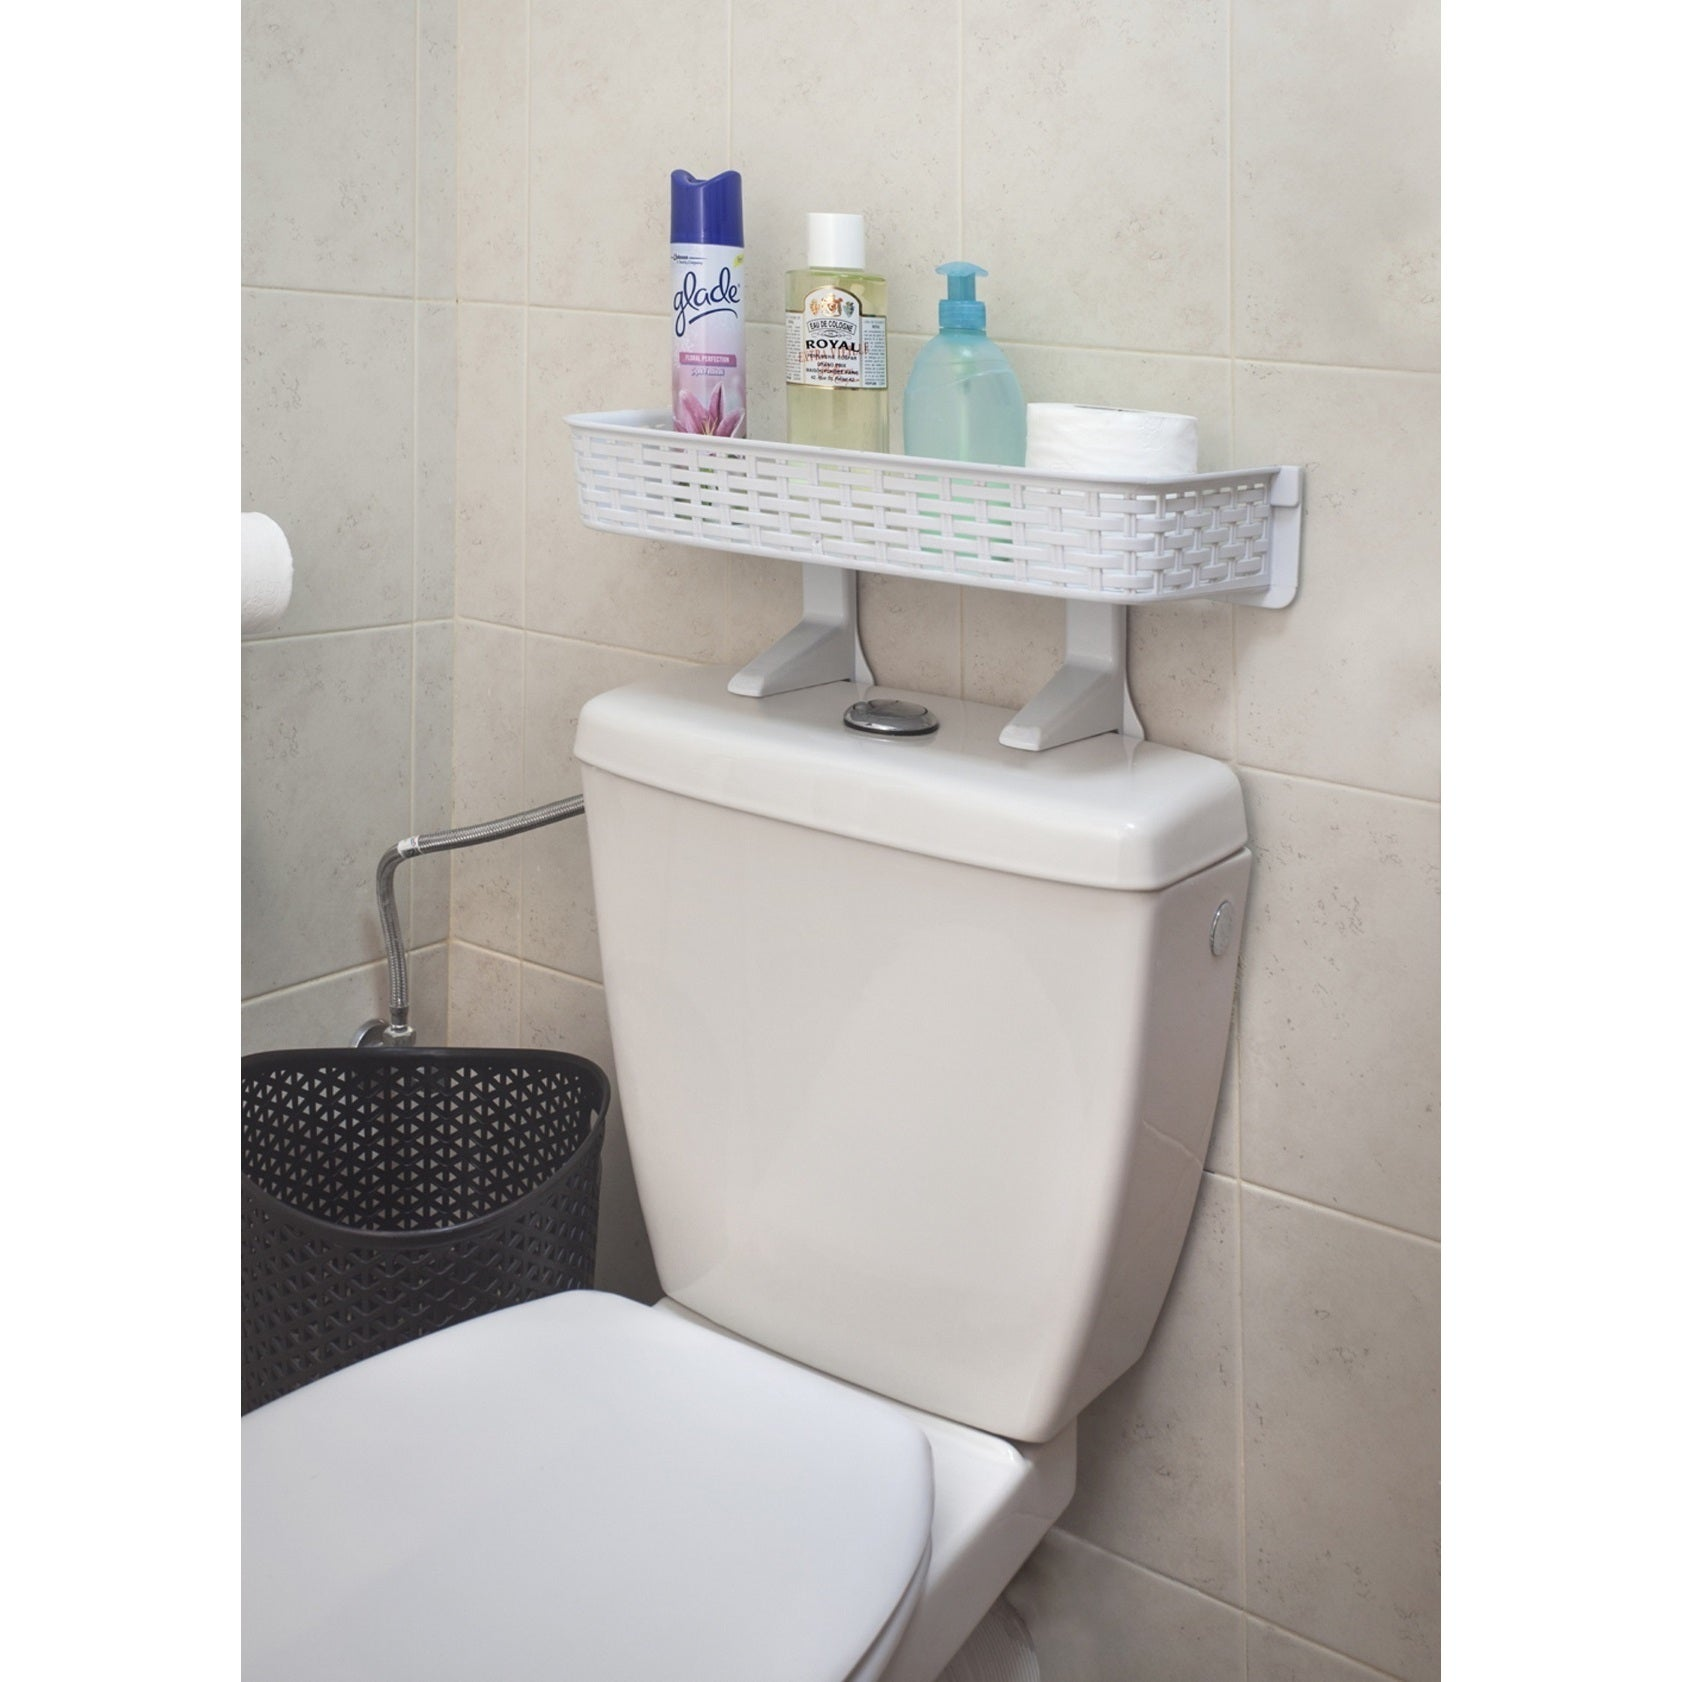 White Rattan Plastic Above Toilet Bathroom E Saver Shelf Free Shipping On Orders Over 45 12604077